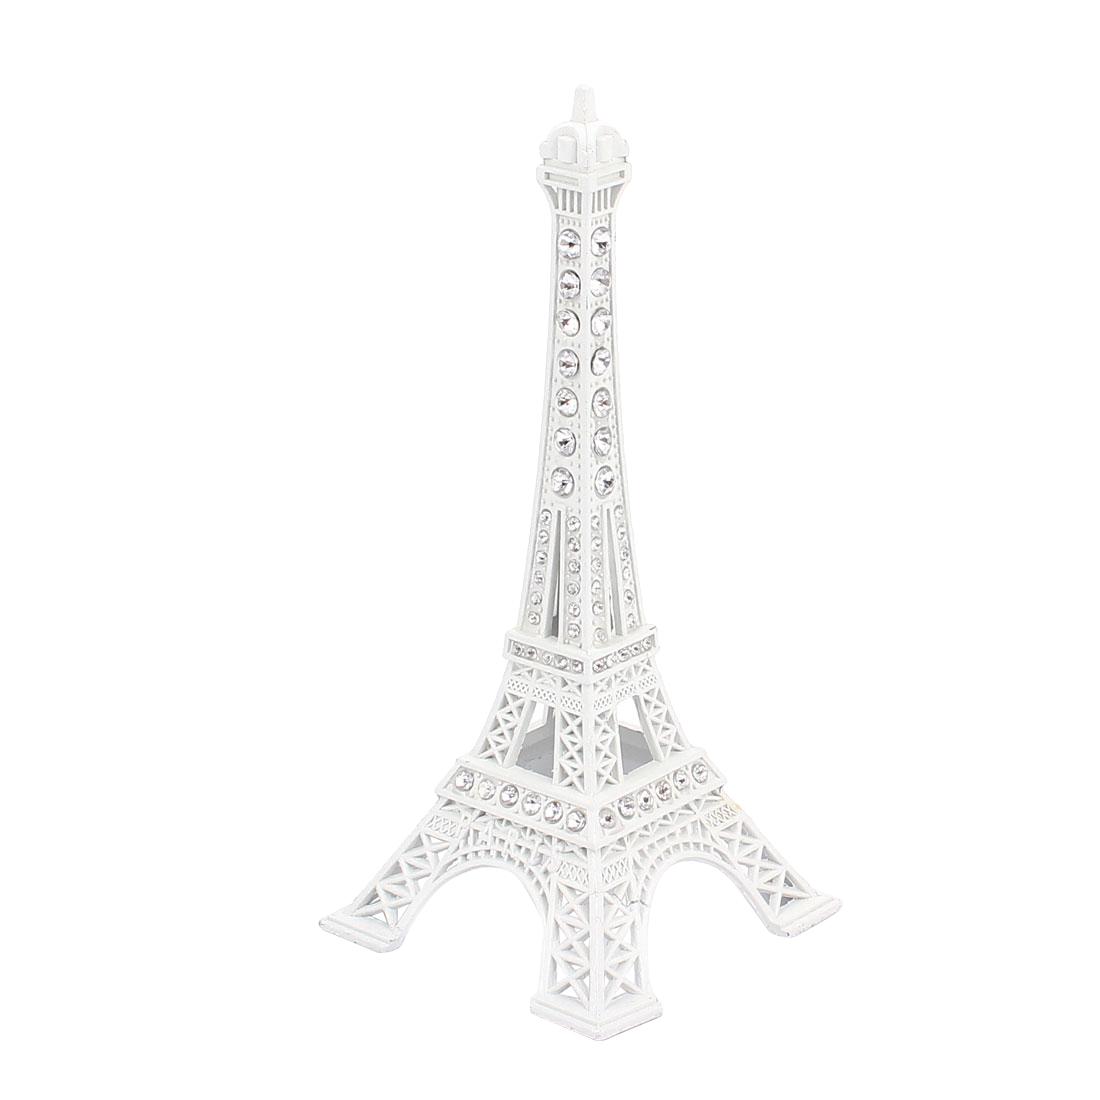 "Rhinestone Detail Mini France Paris Eiffel Tower Sculpture Statue Model Ornament 5"" Height White"